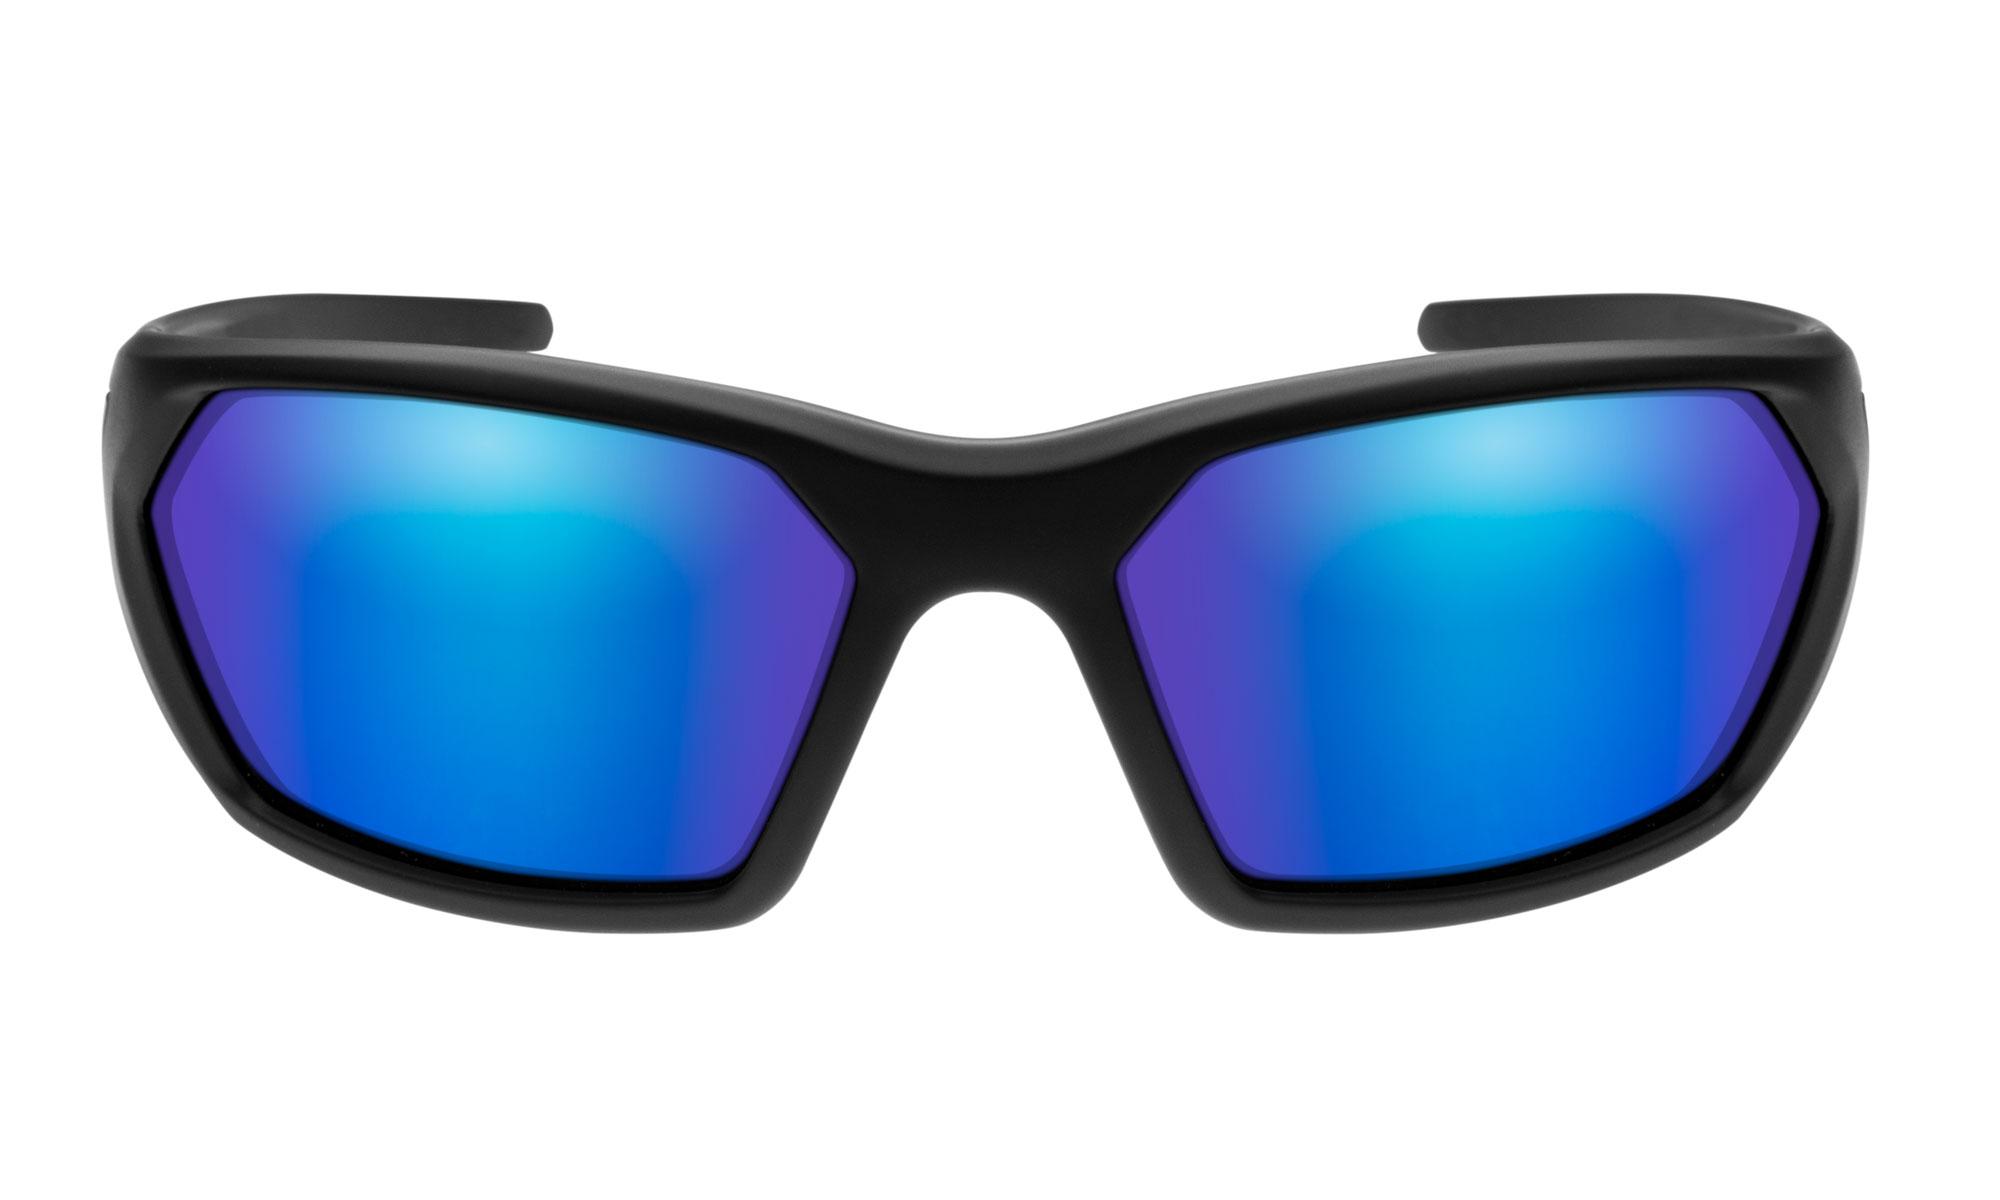 ab082800b5bc6 Wiley-X WX Ignite Matte Black with Polarized Blue Mirror Lenses ...